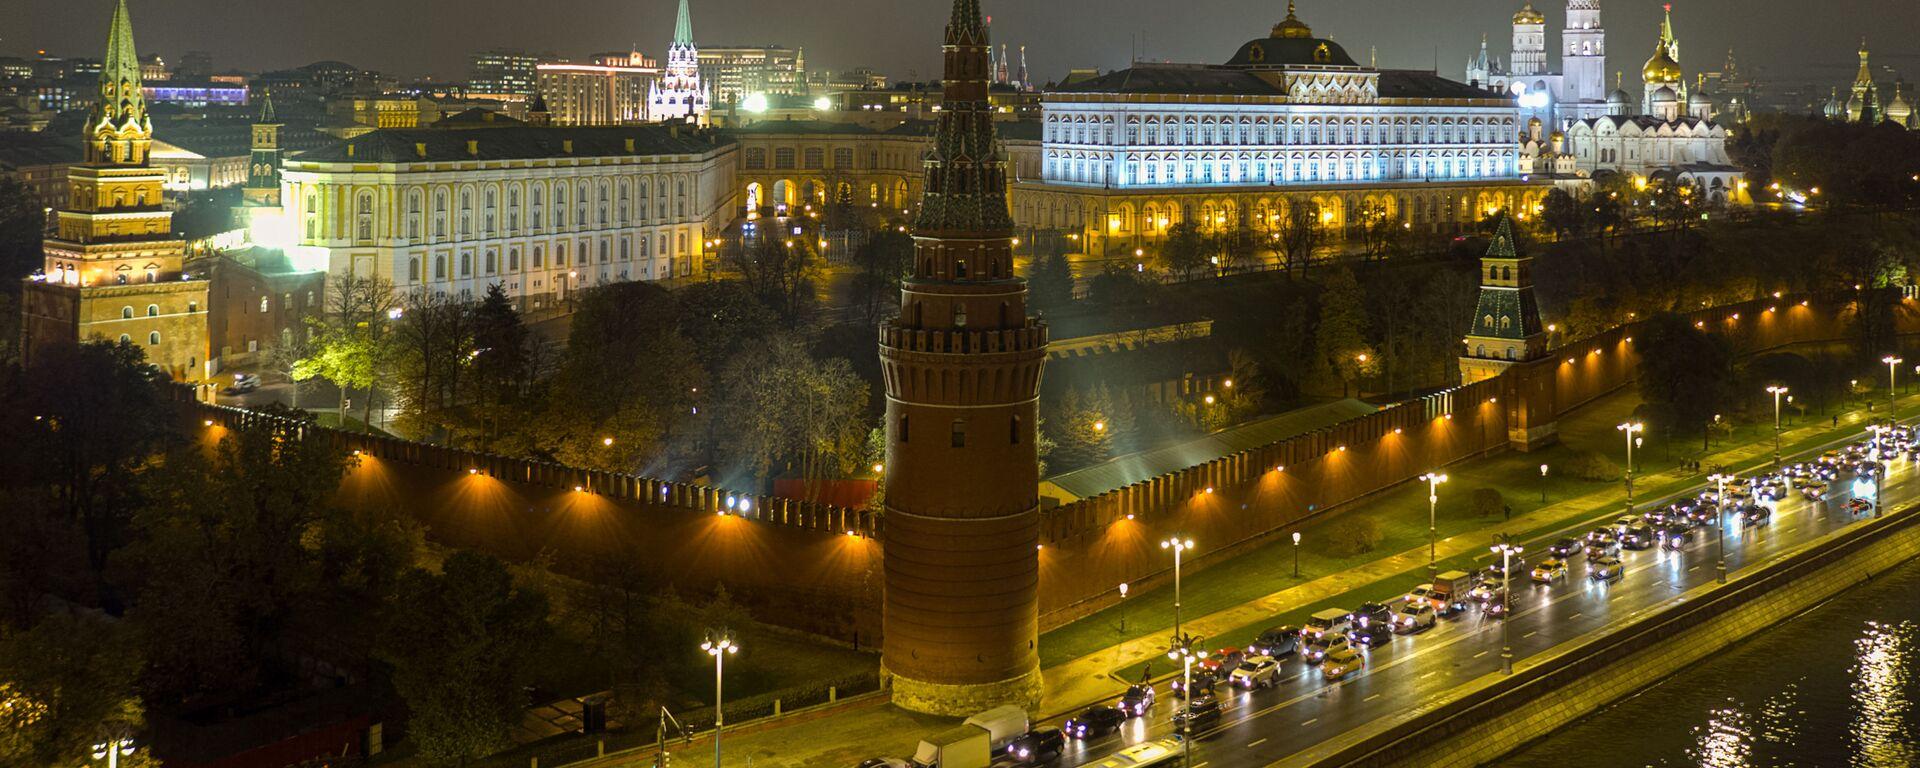 Moskwa, Kreml - Sputnik Polska, 1920, 24.03.2021